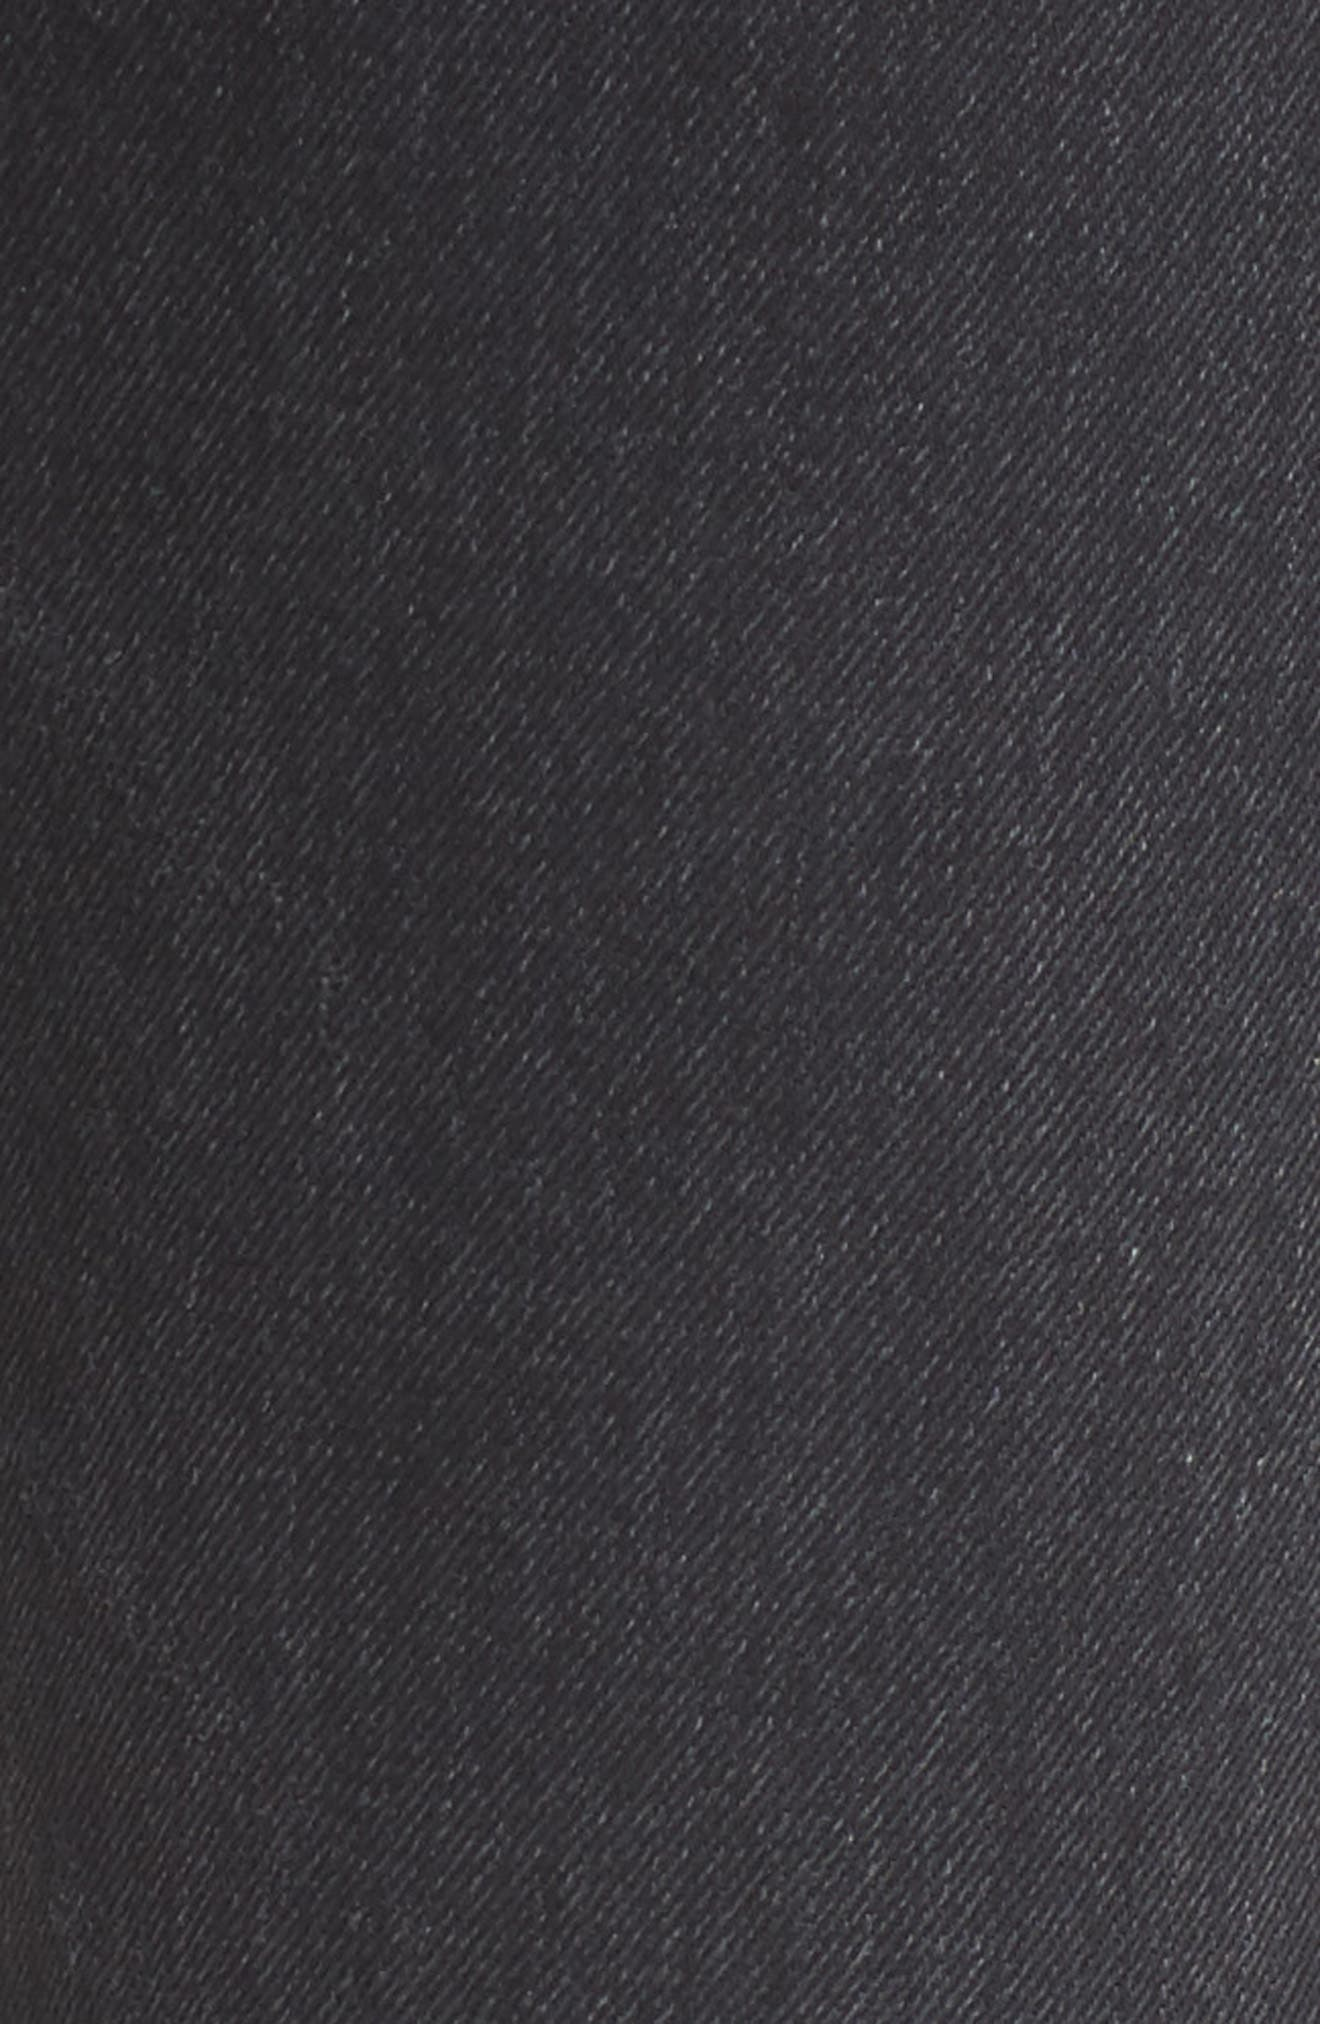 Sasha Twist Crop Jeans,                             Alternate thumbnail 5, color,                             BLACK HAWK